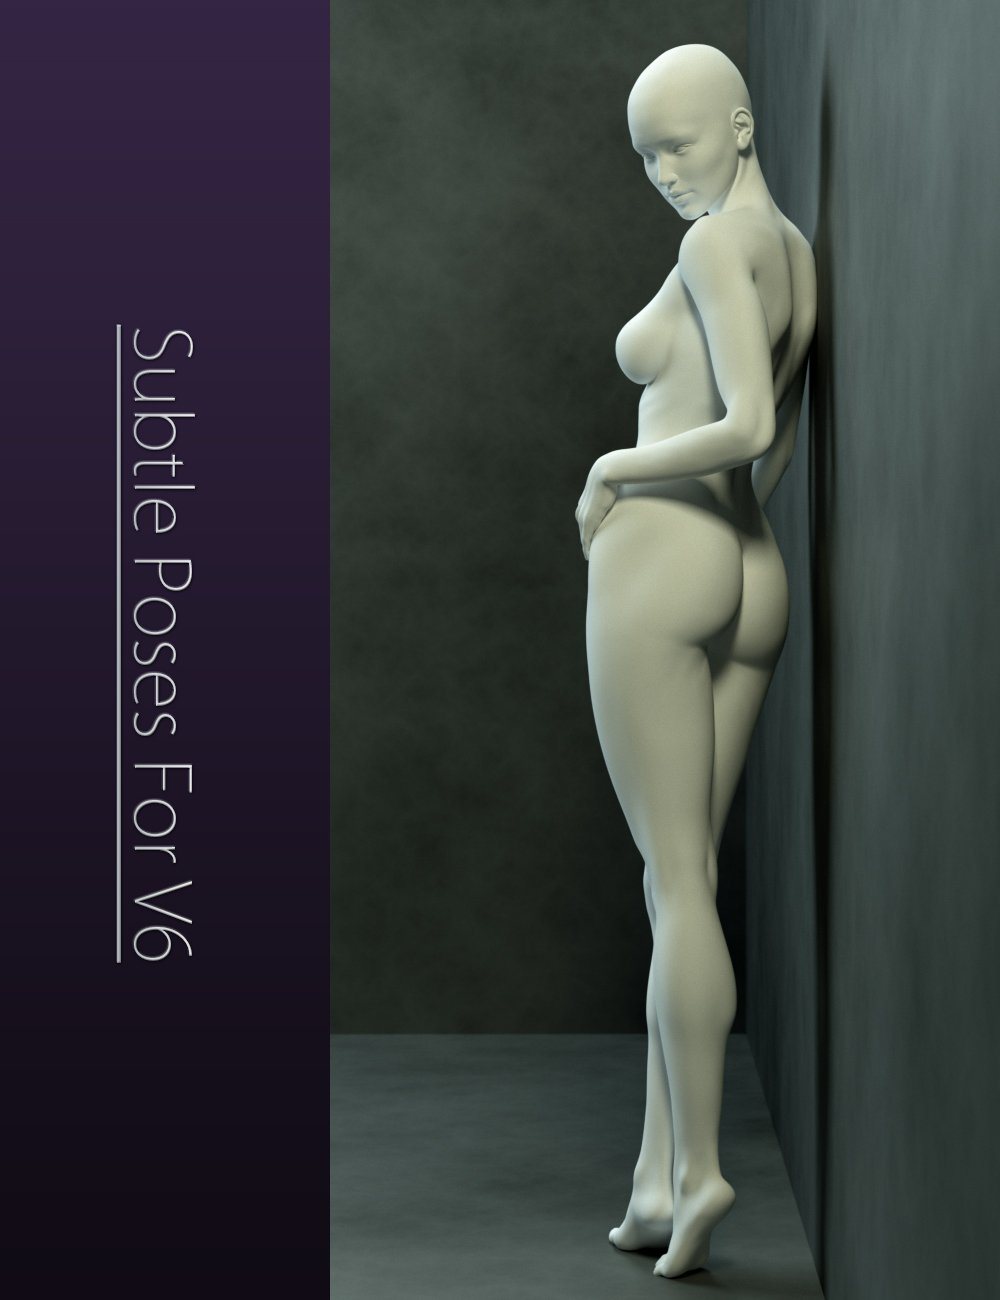 Subtle Poses for Victoria 6 by: Elele, 3D Models by Daz 3D